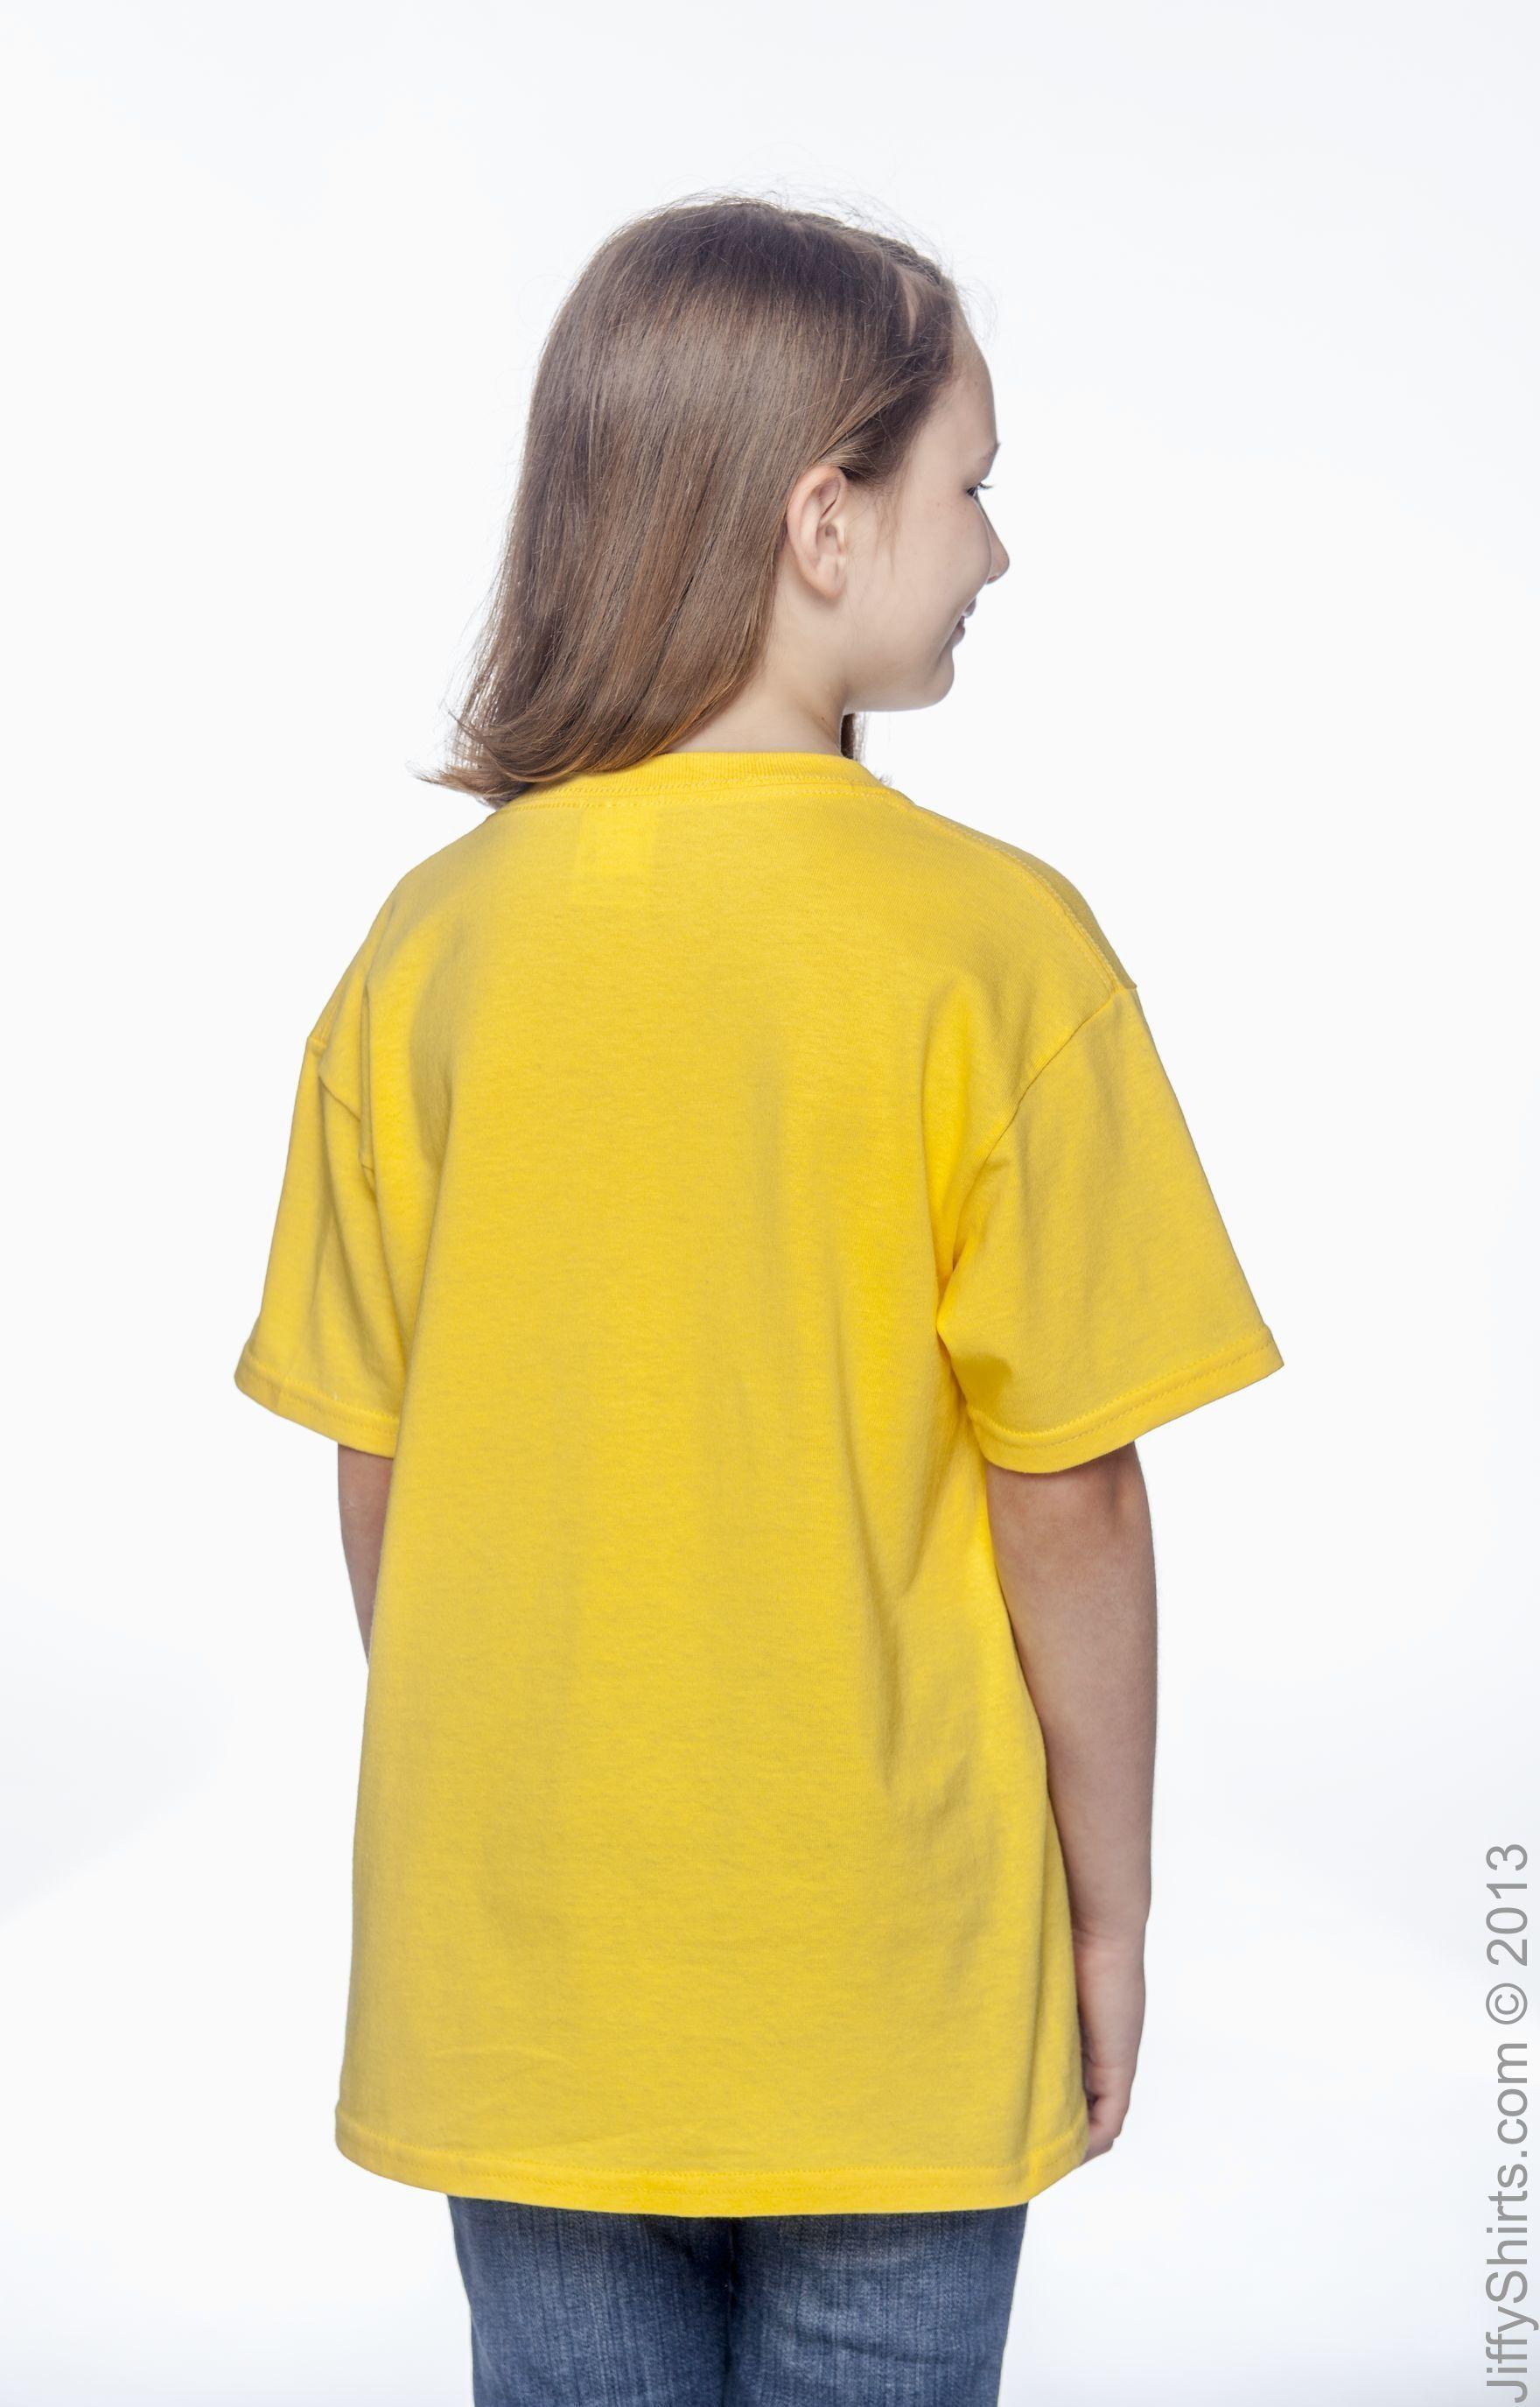 Pick color also gildan   youth oz  shirt jiffyshirts rh